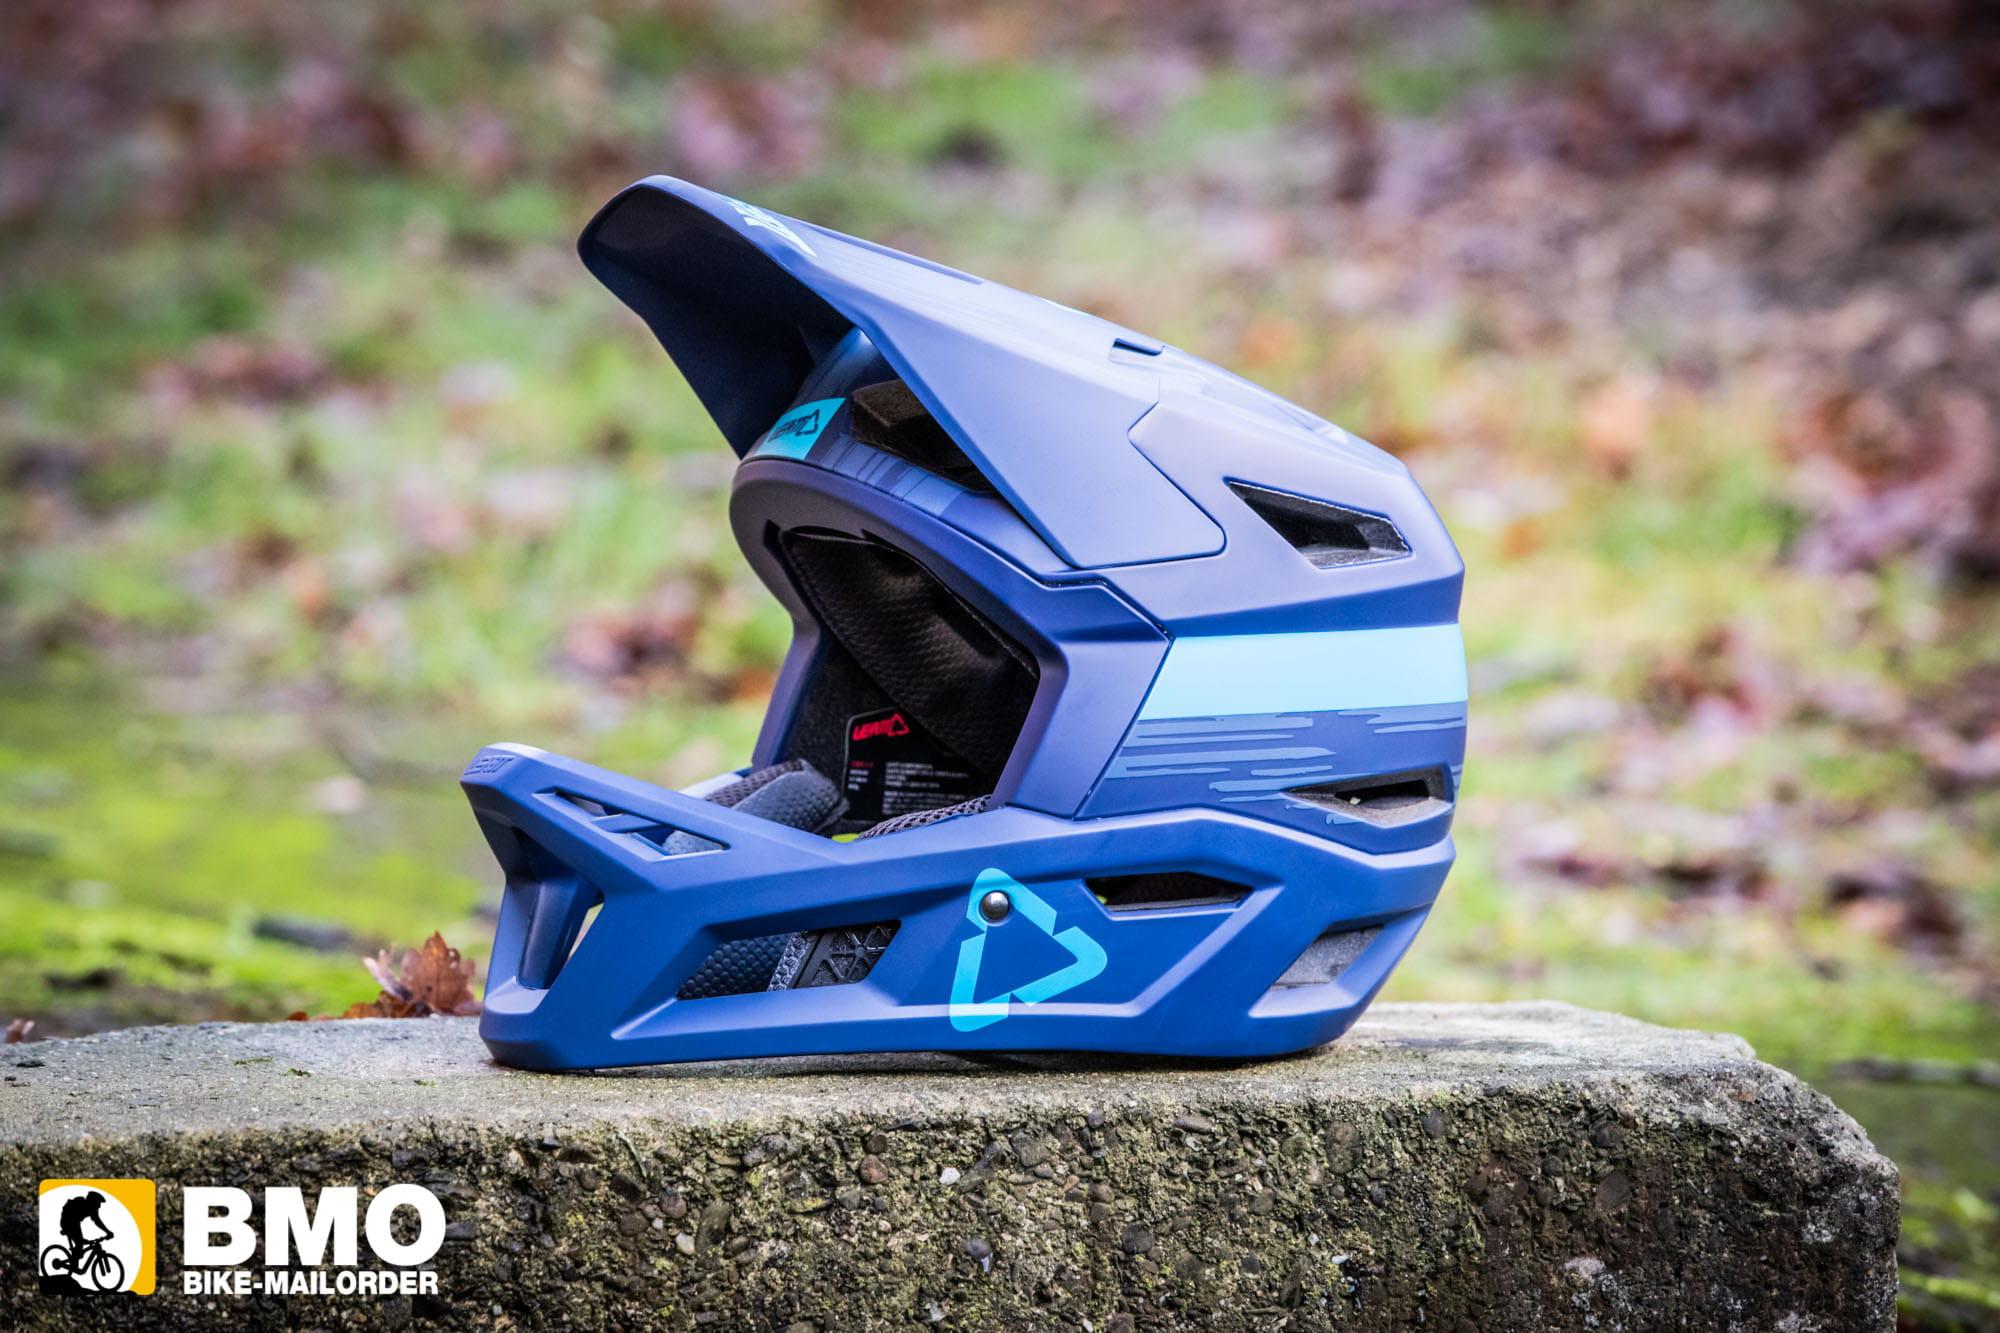 leatt-dbx-4-0-helm-bike-mailorder-2